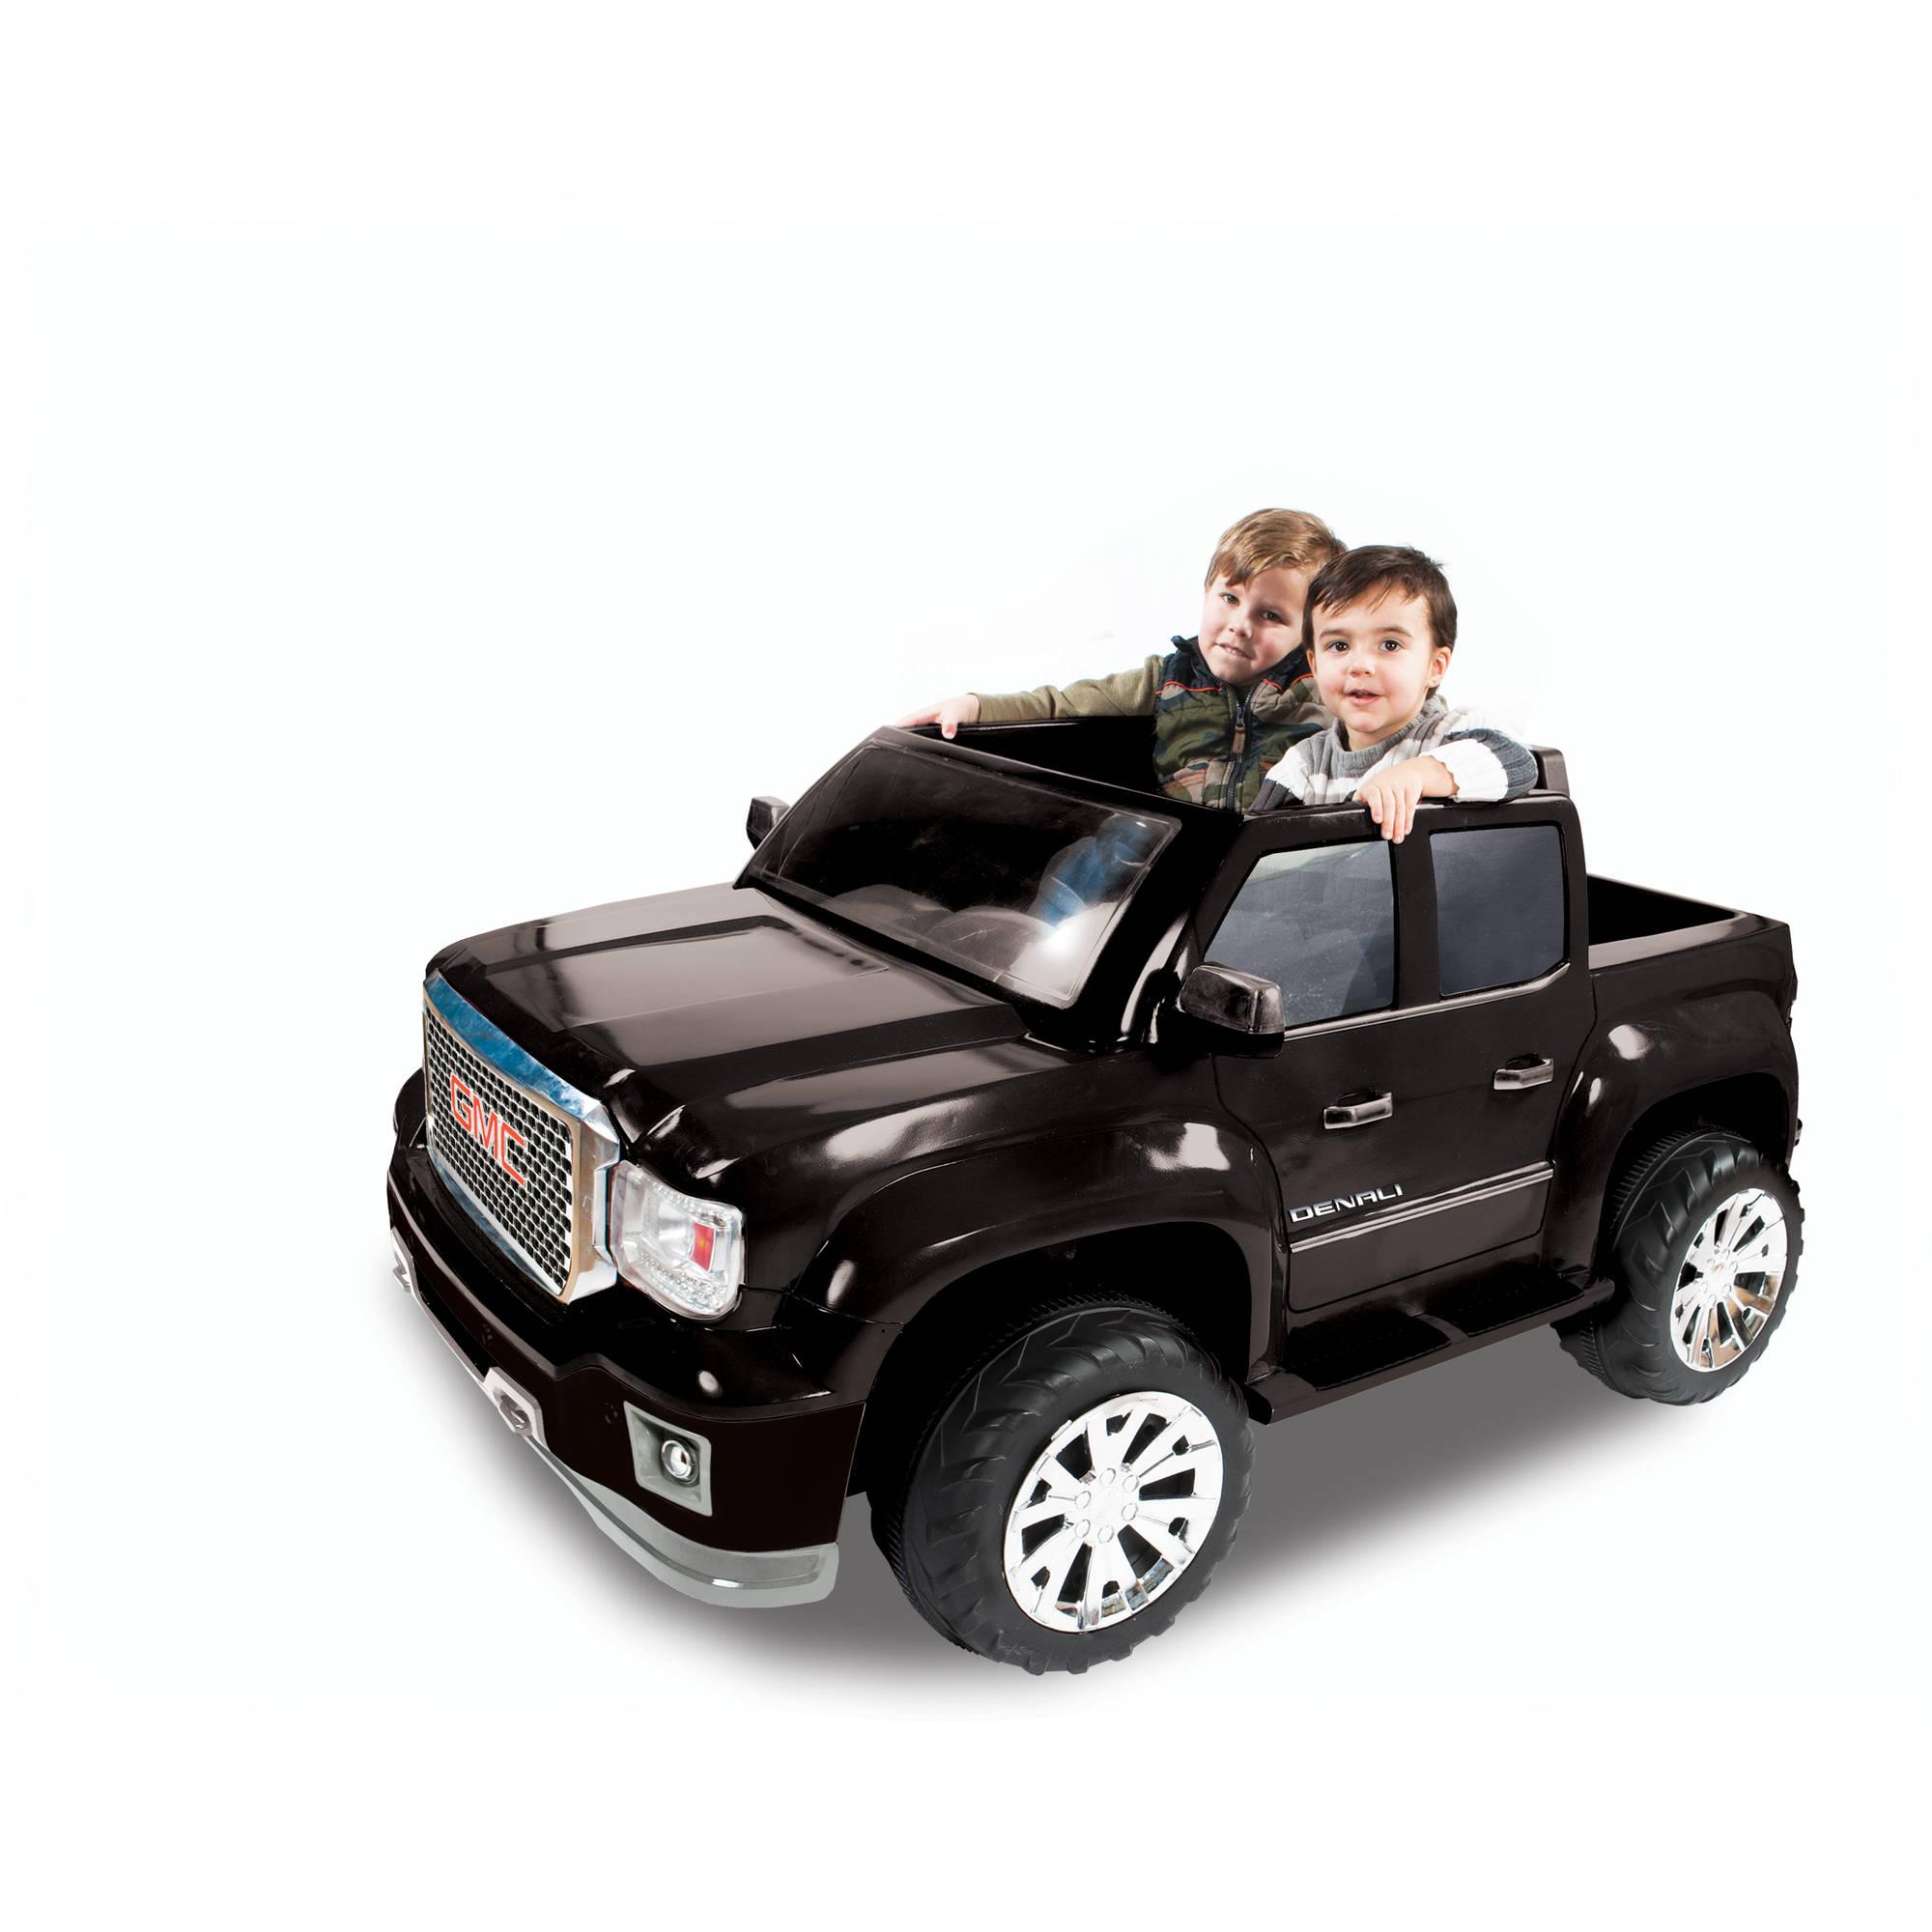 RollPlay 12V GMC Sierra Denali Ride-On